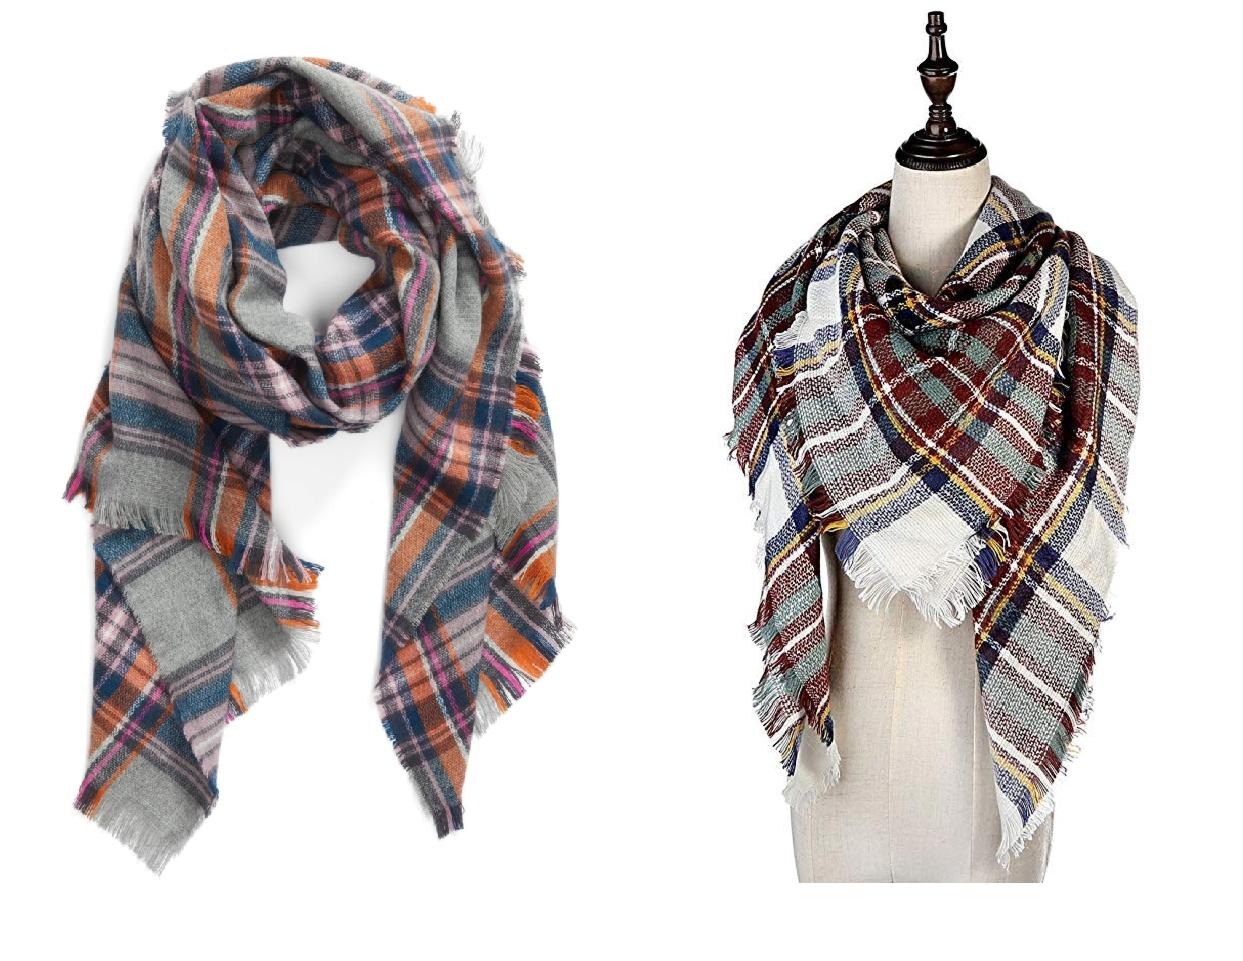 nordstrom anniversary sale dupes, plaid blanket scarf